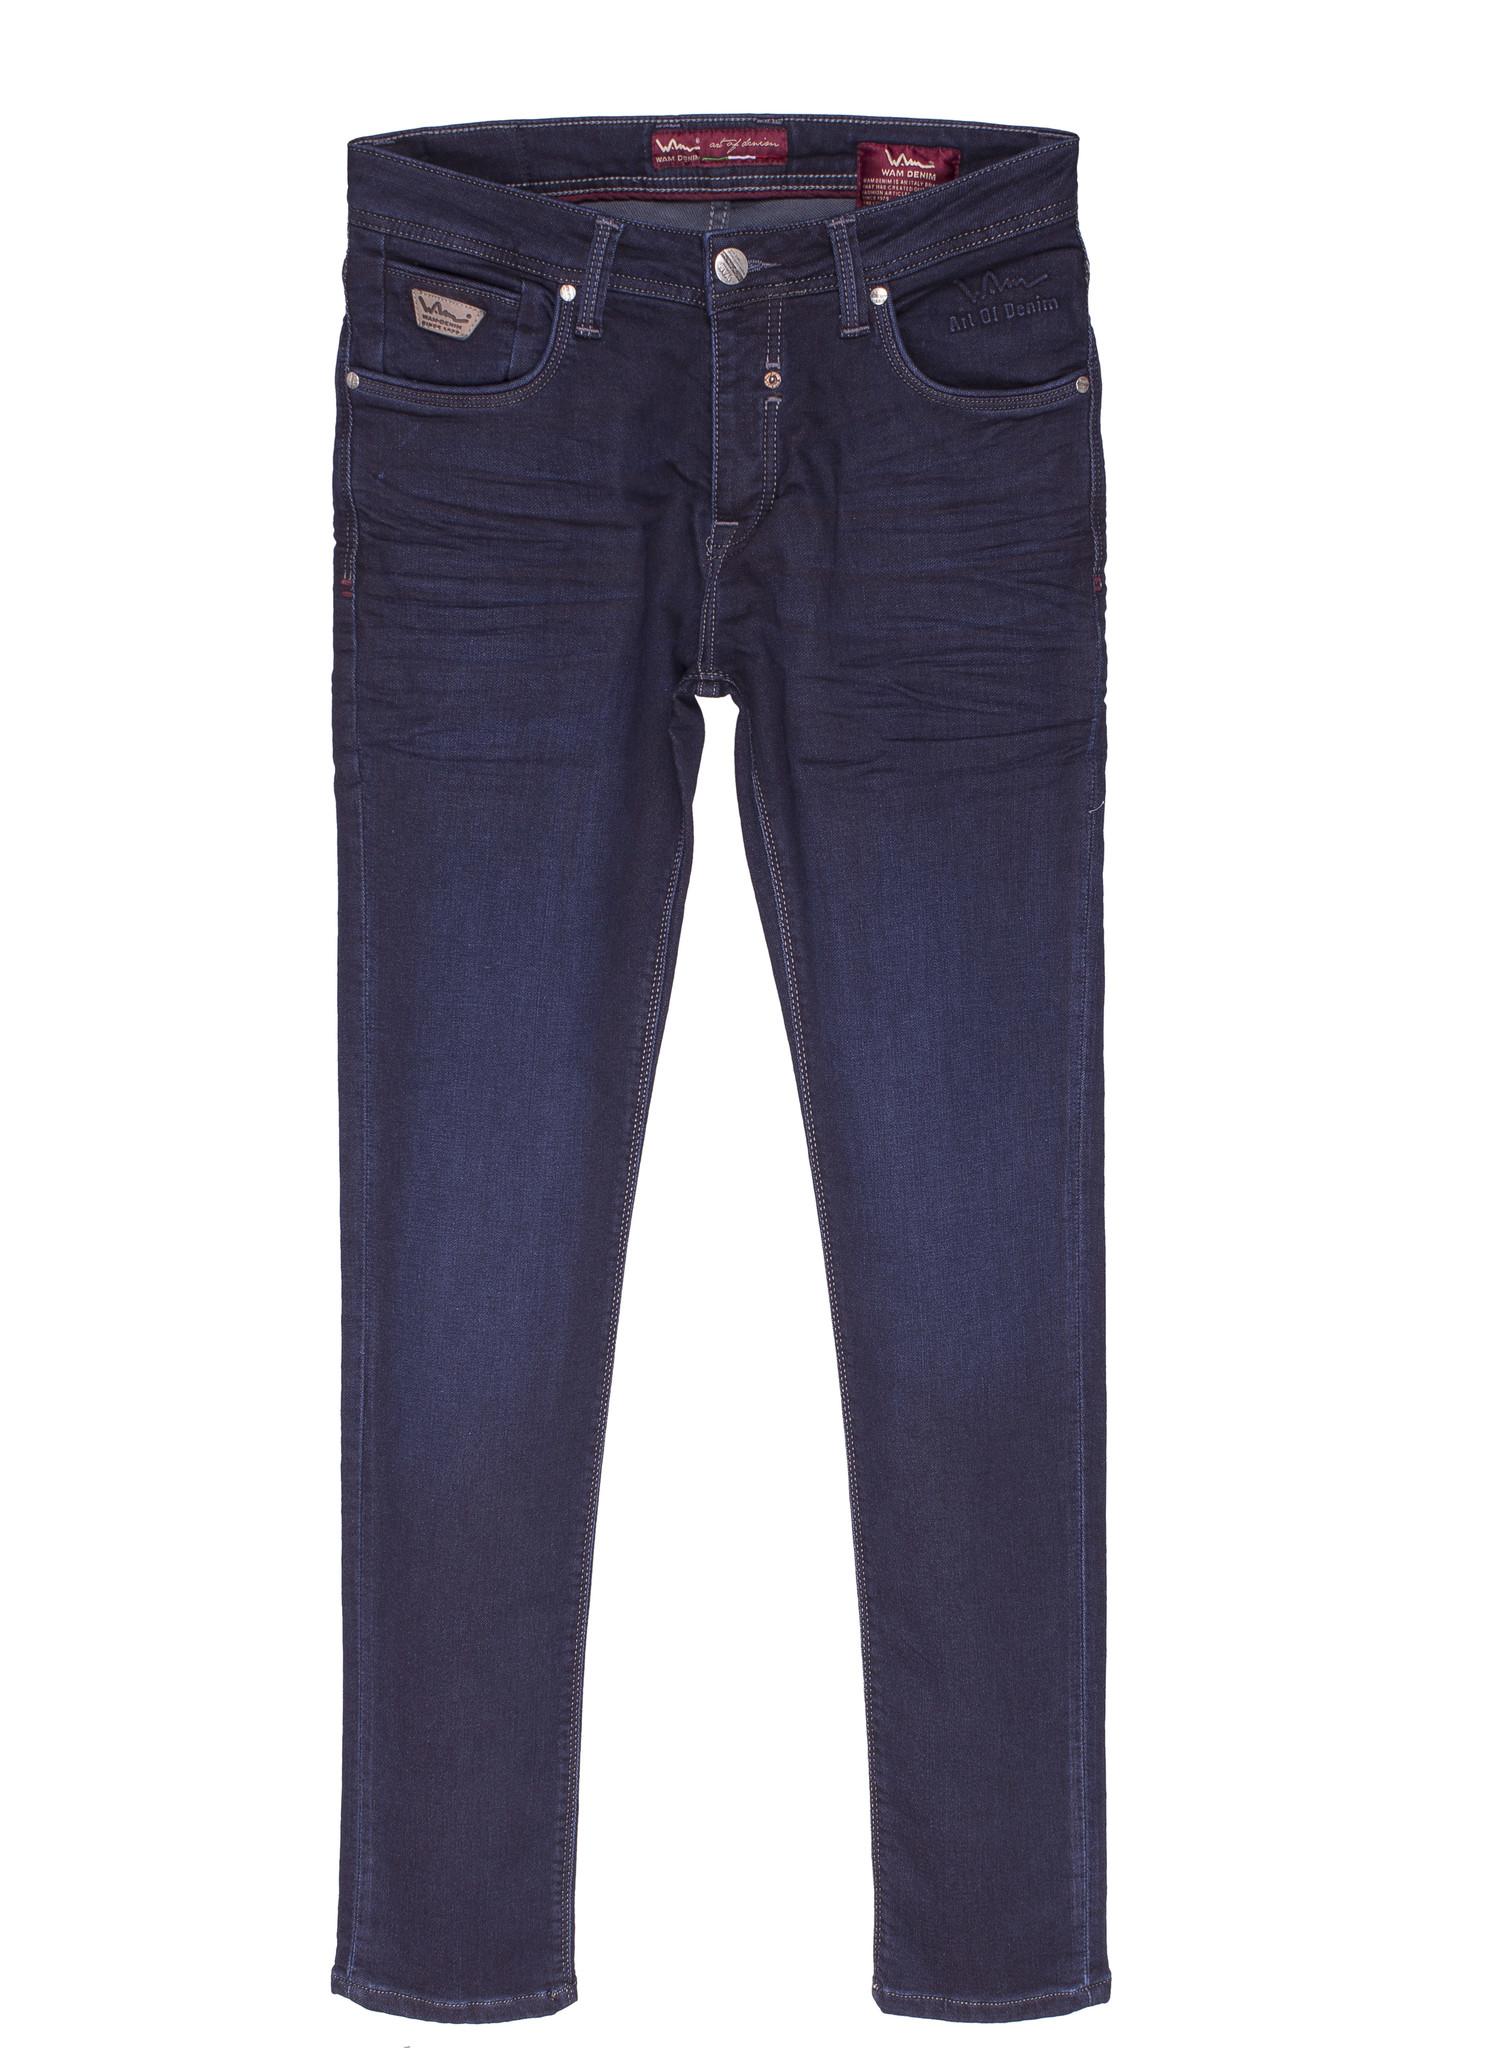 Wam Denim Jeans 92161 Dark Blue